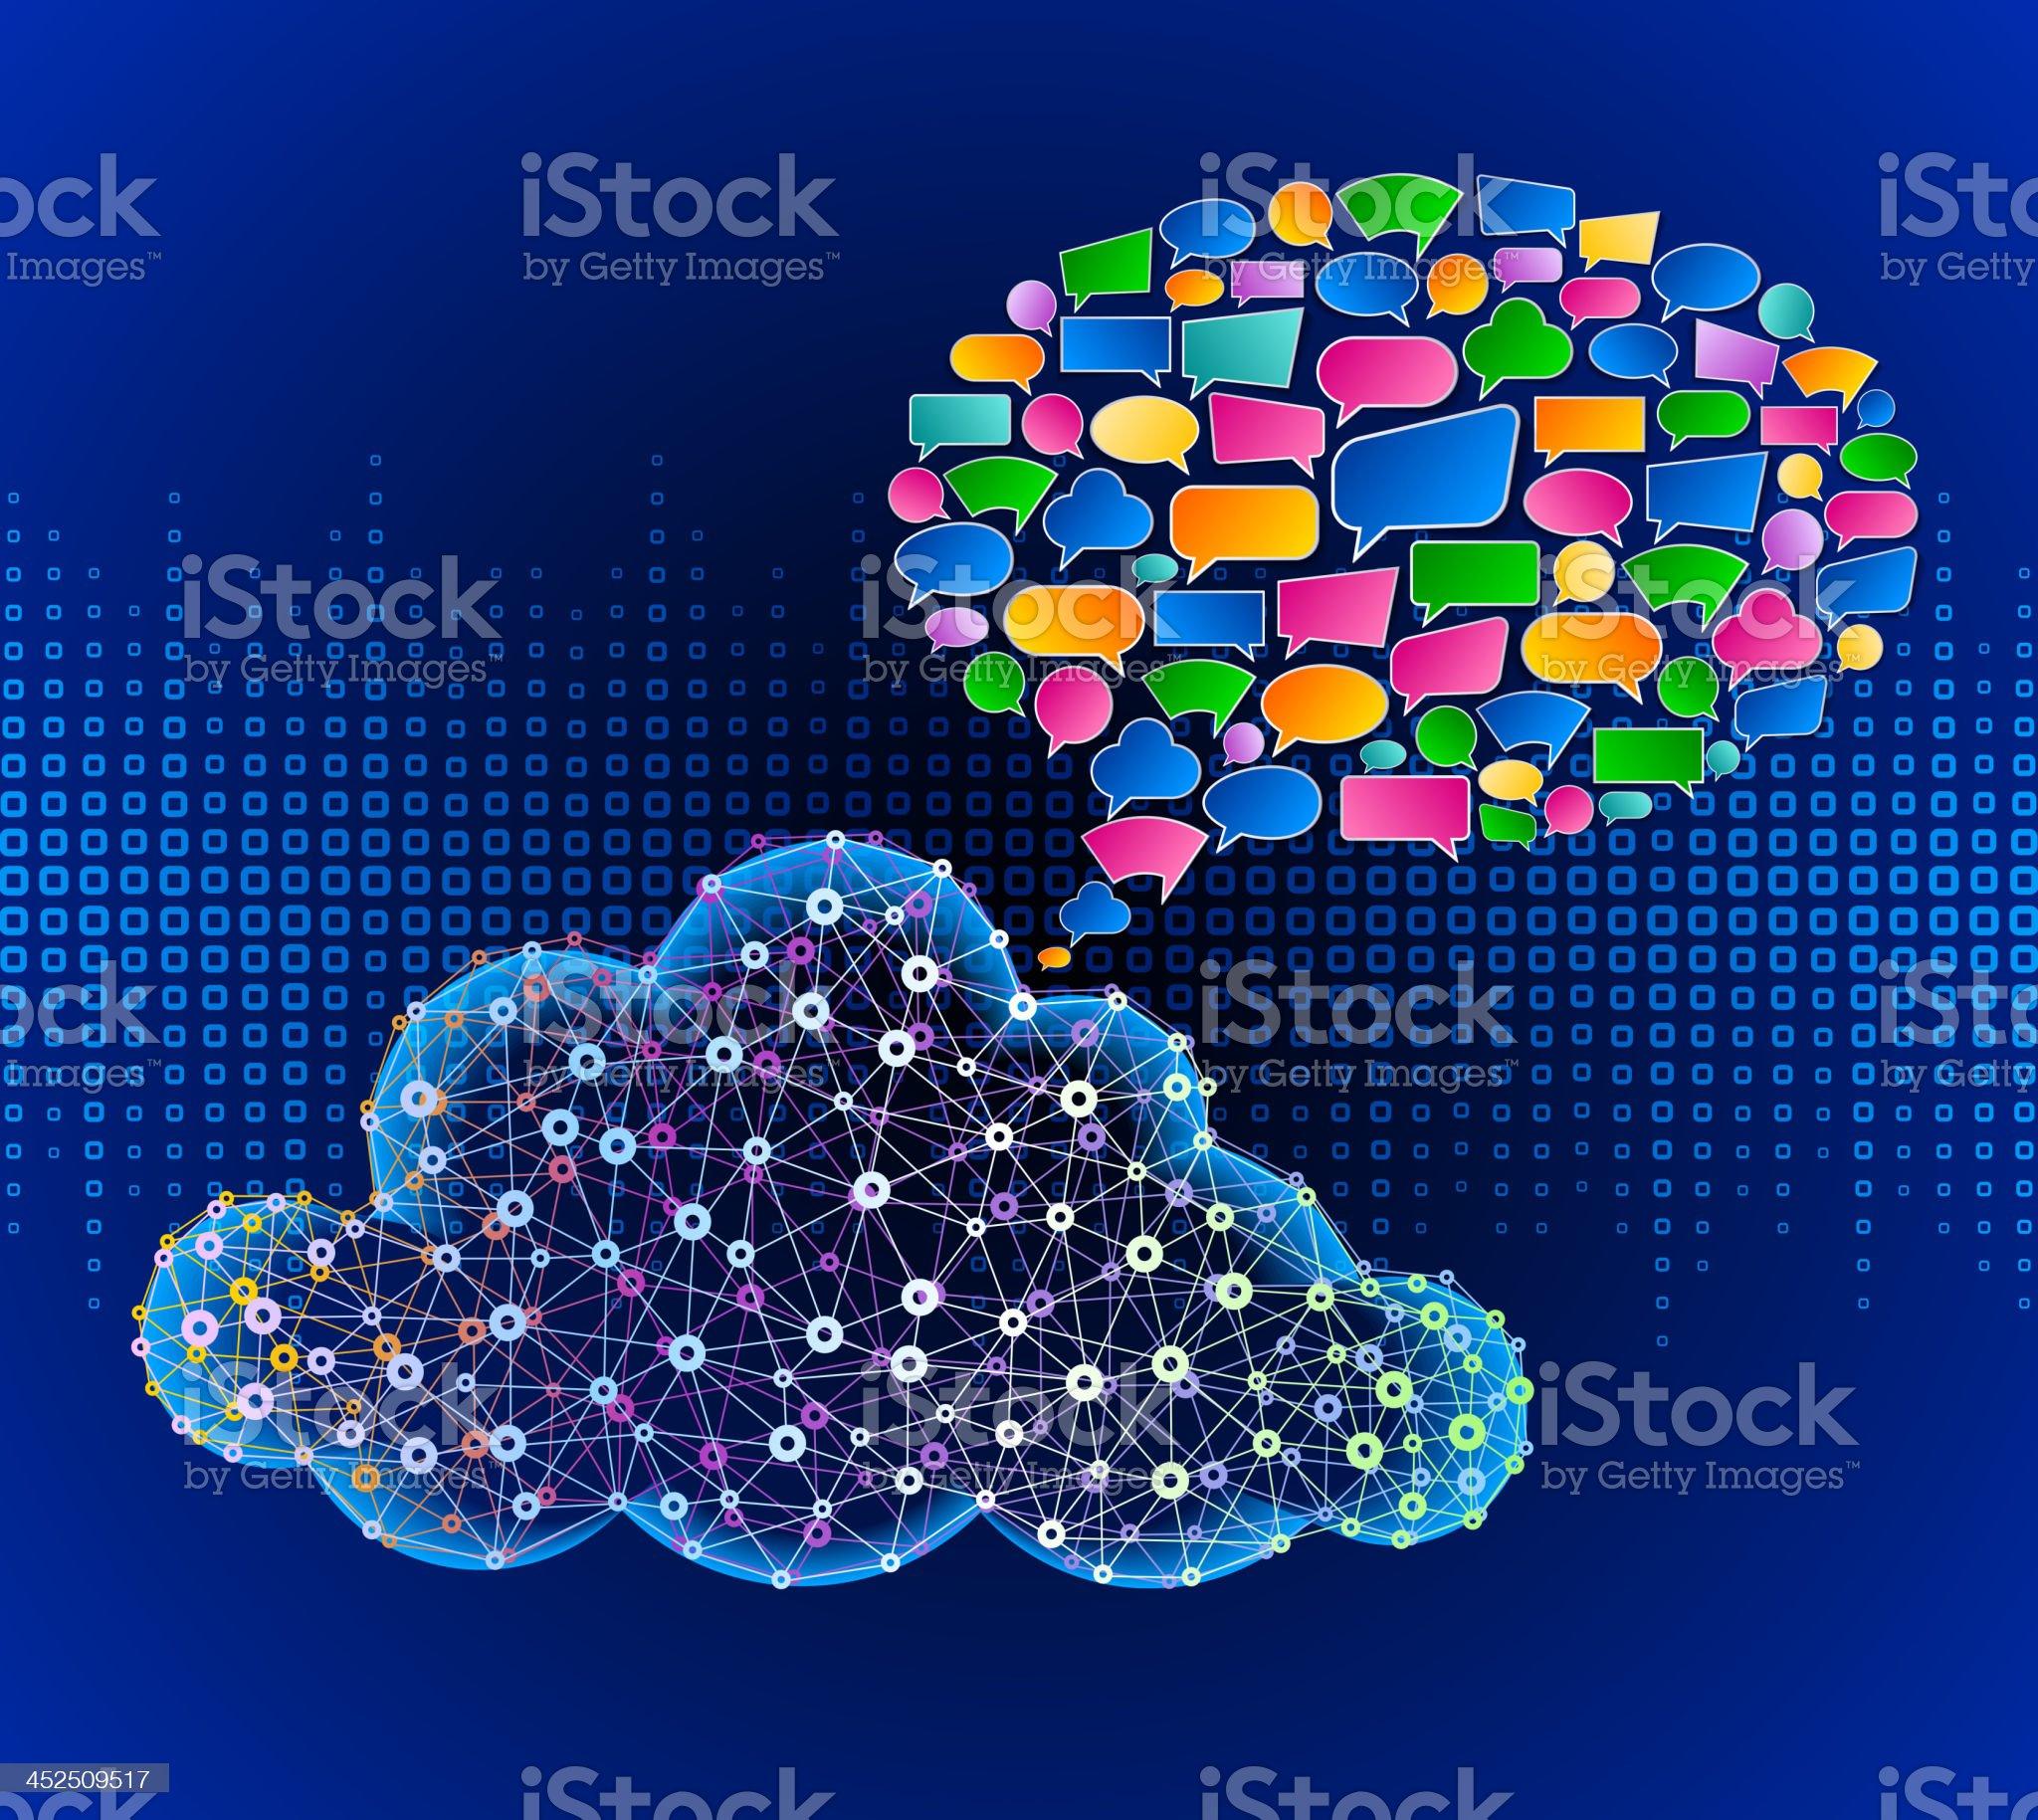 Cloud Computing Communication Technology royalty-free stock vector art